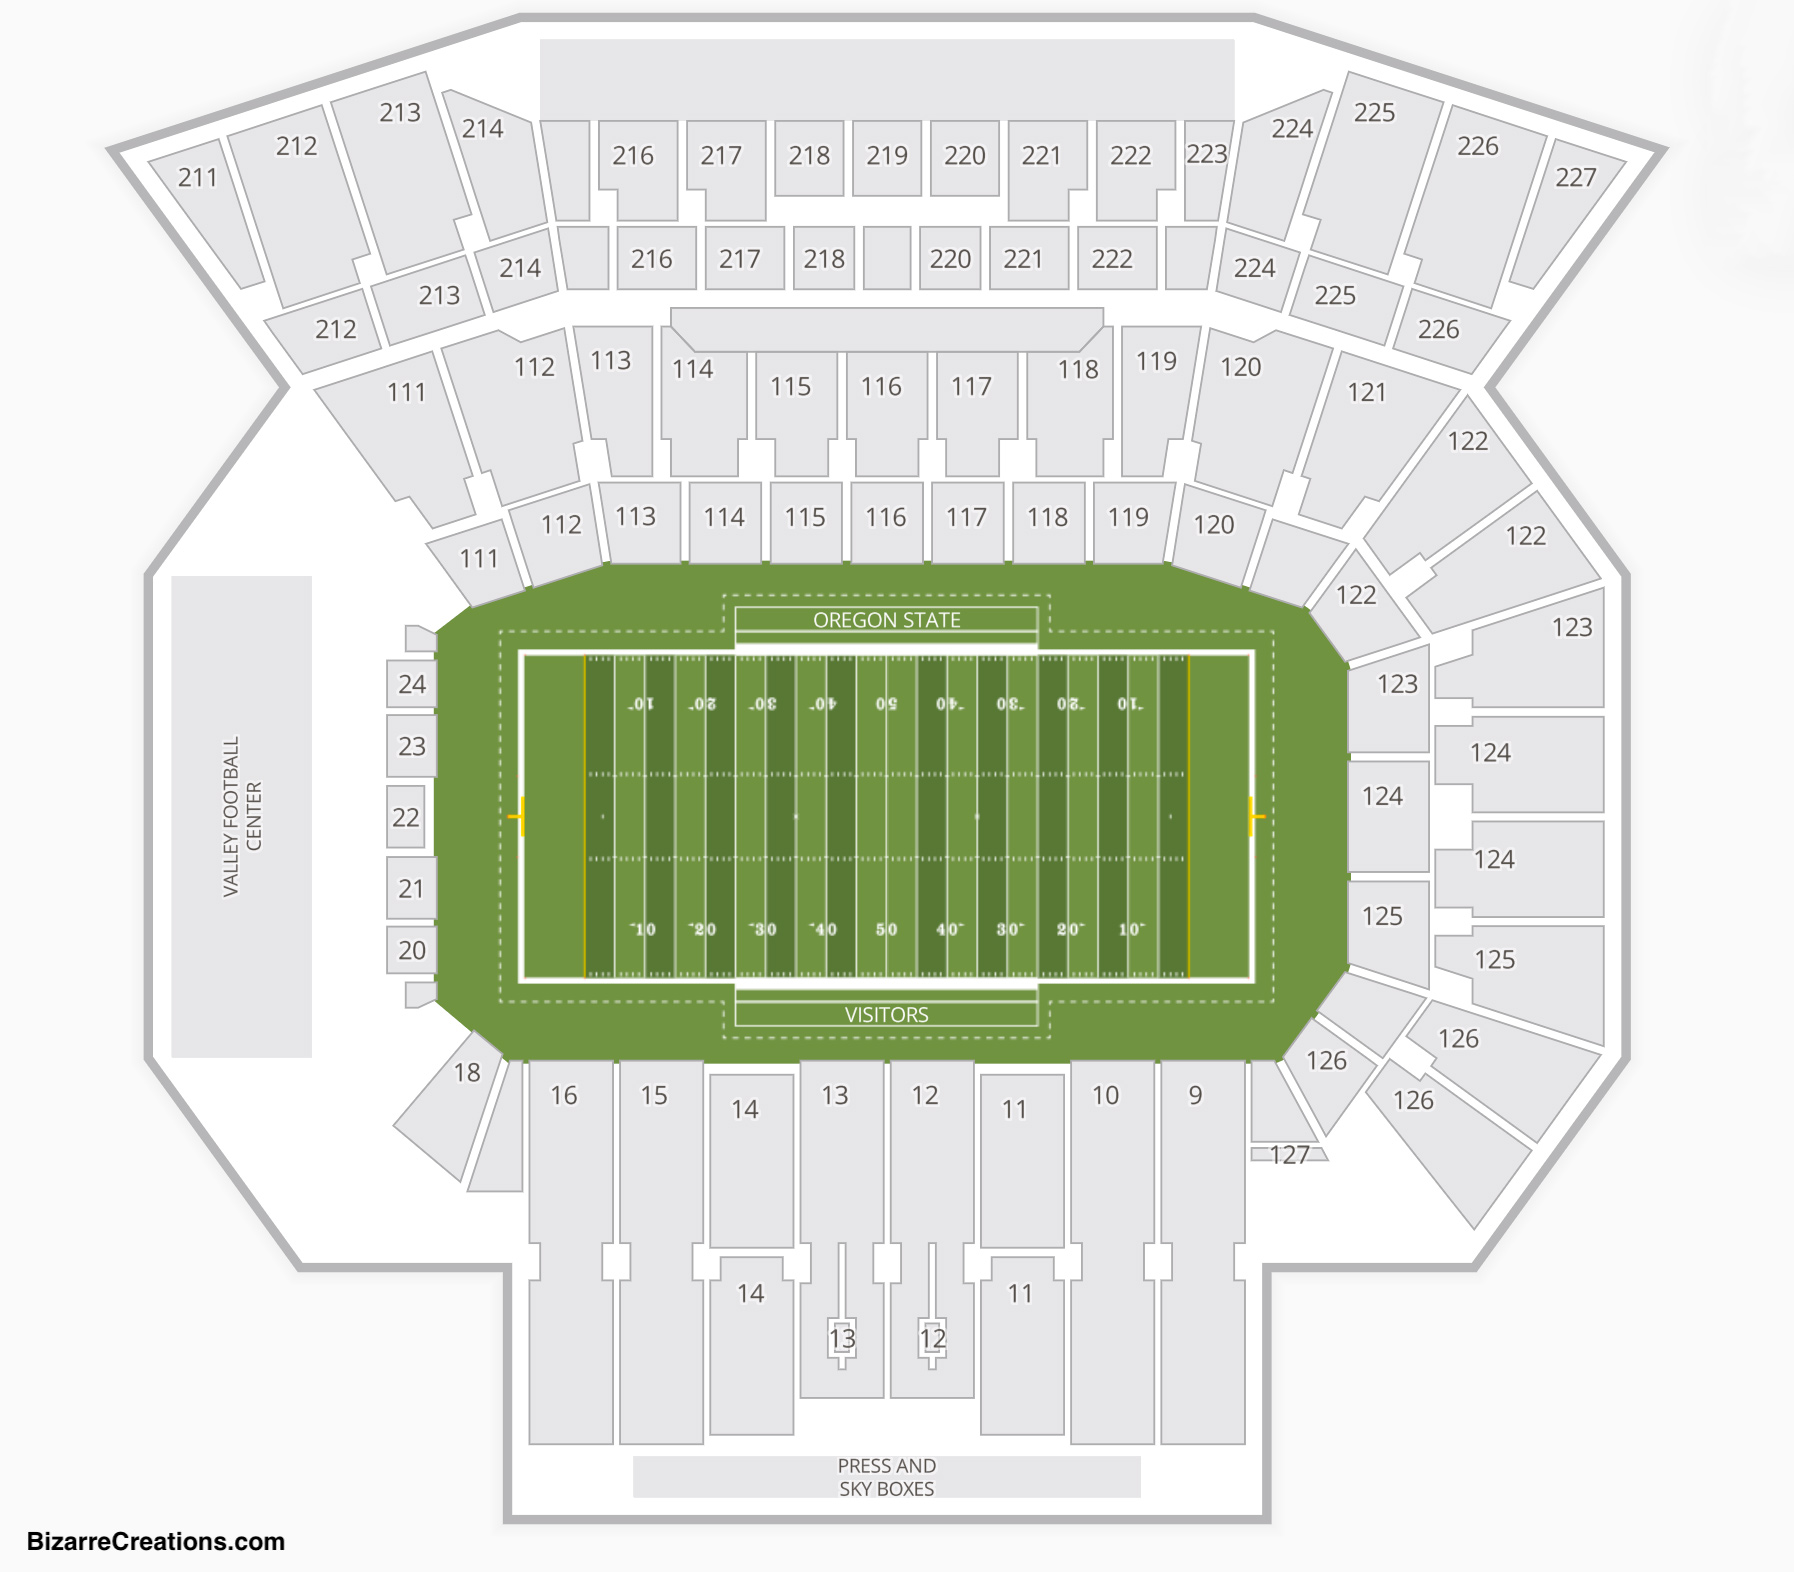 Reser Stadium Seating Chart Concert